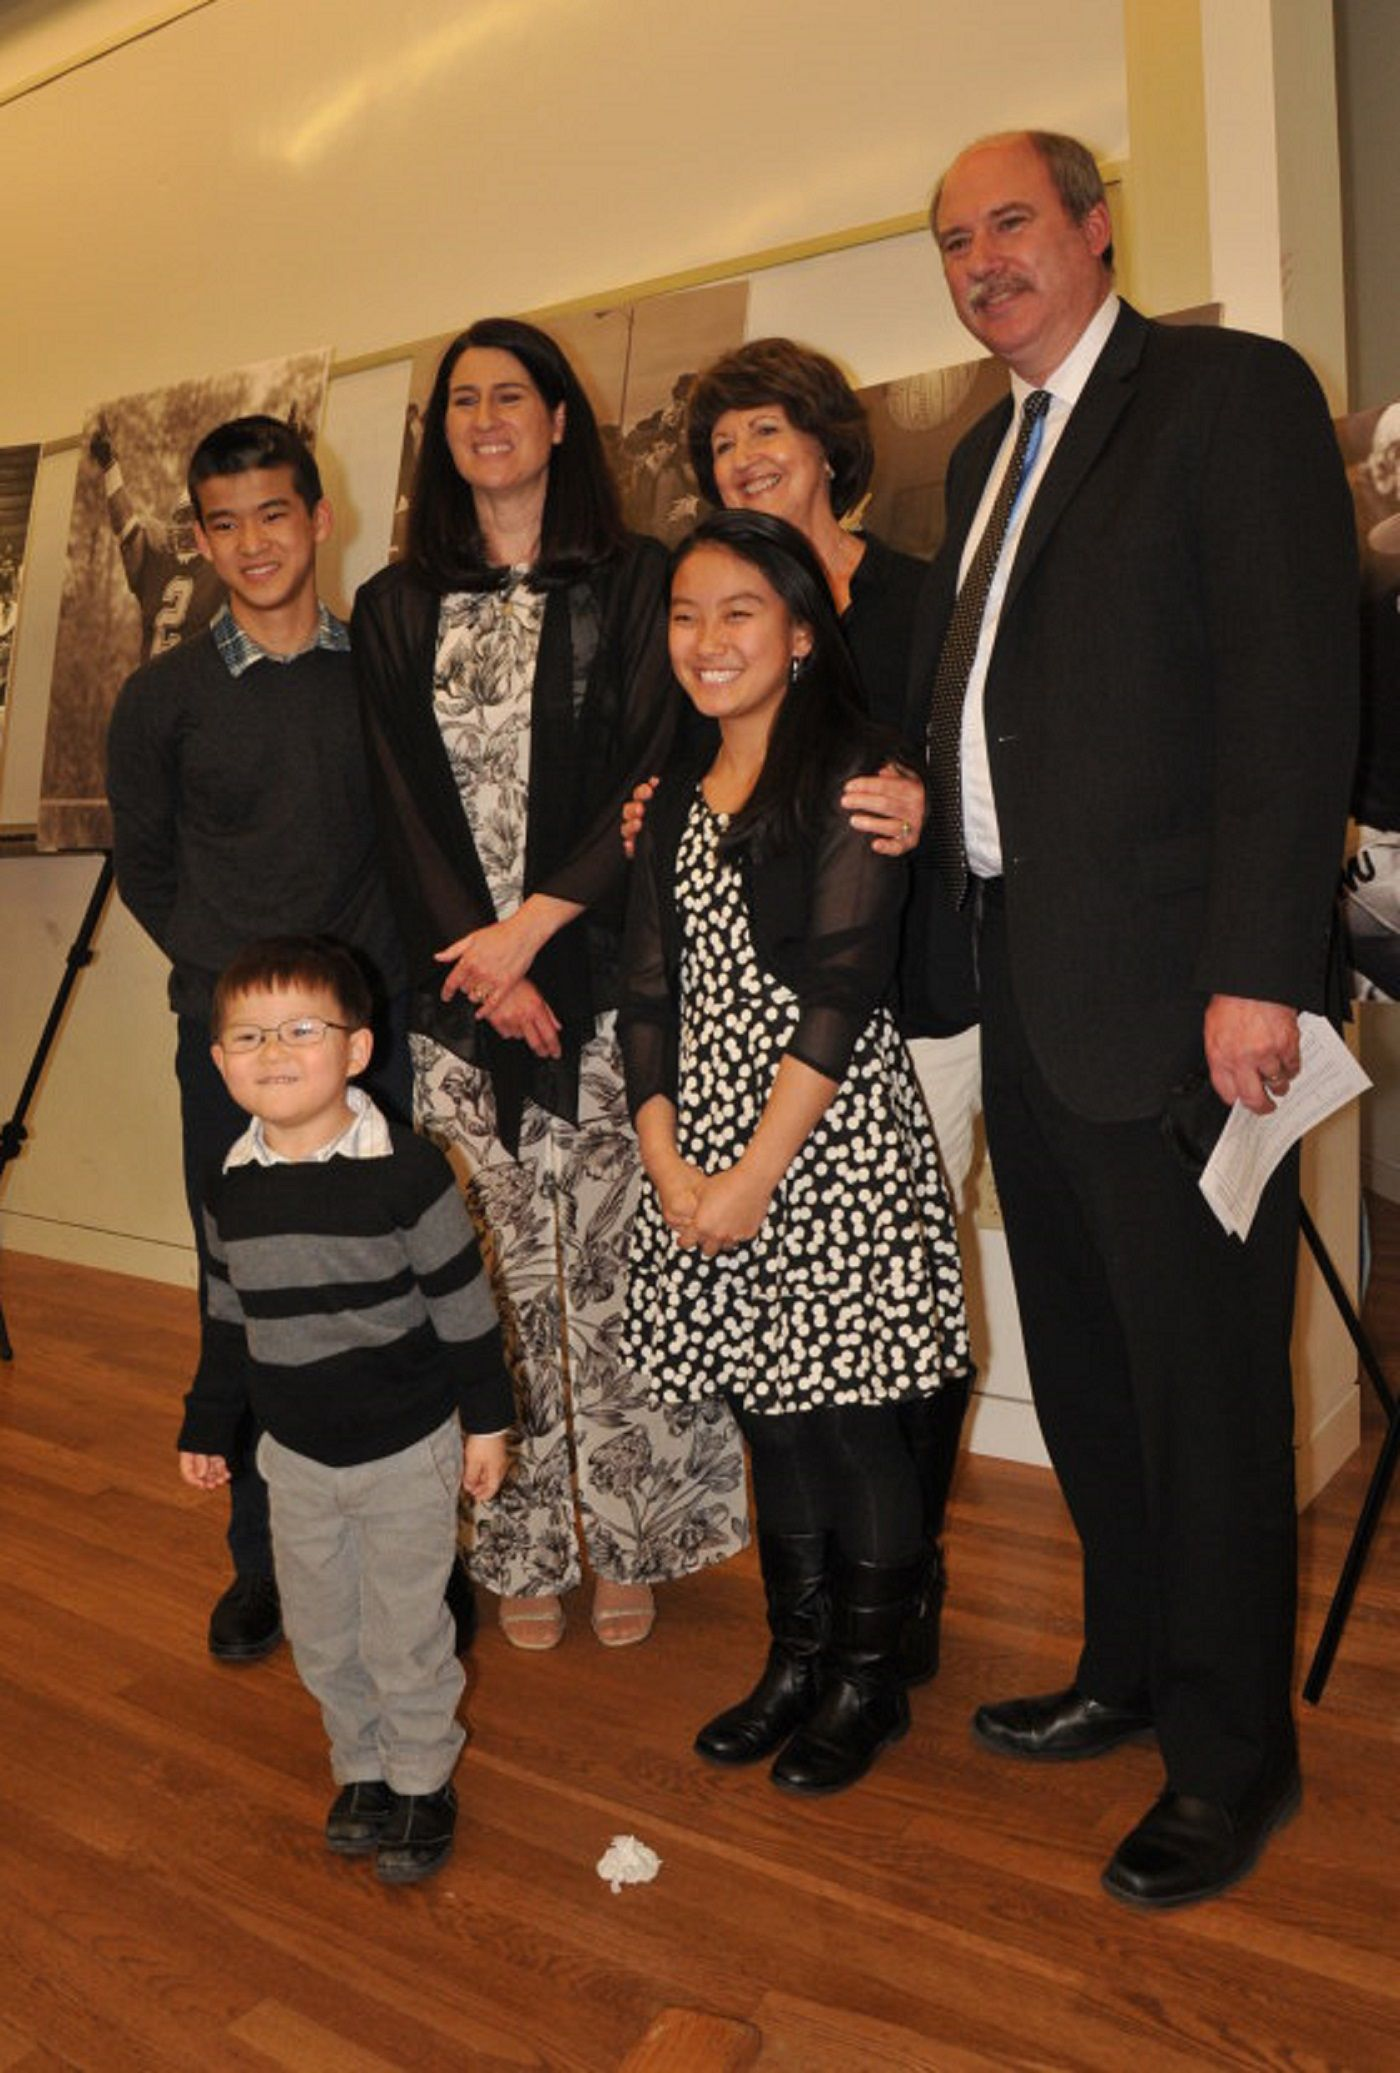 Jim Caviezel With His Kids | www.pixshark.com - Images ...